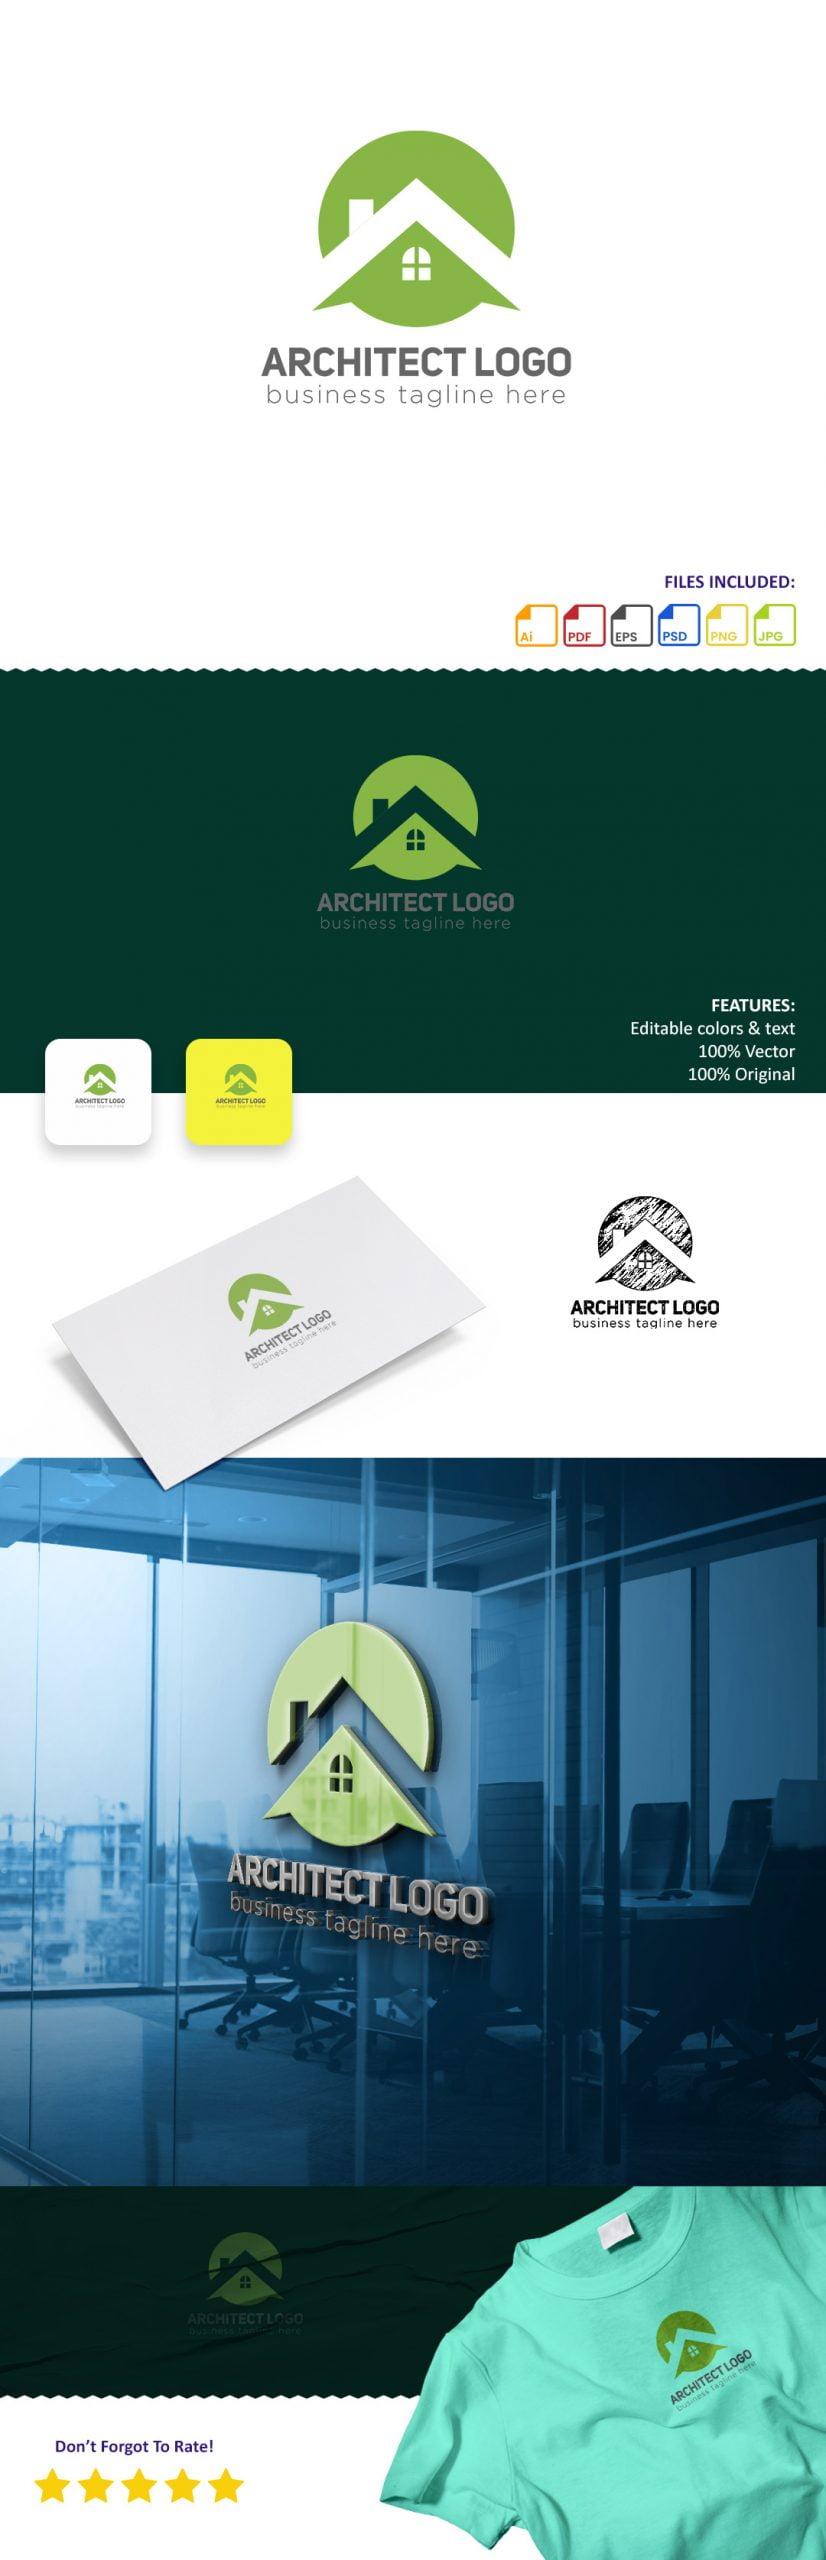 Logo-Preview-Image-Generator-Free